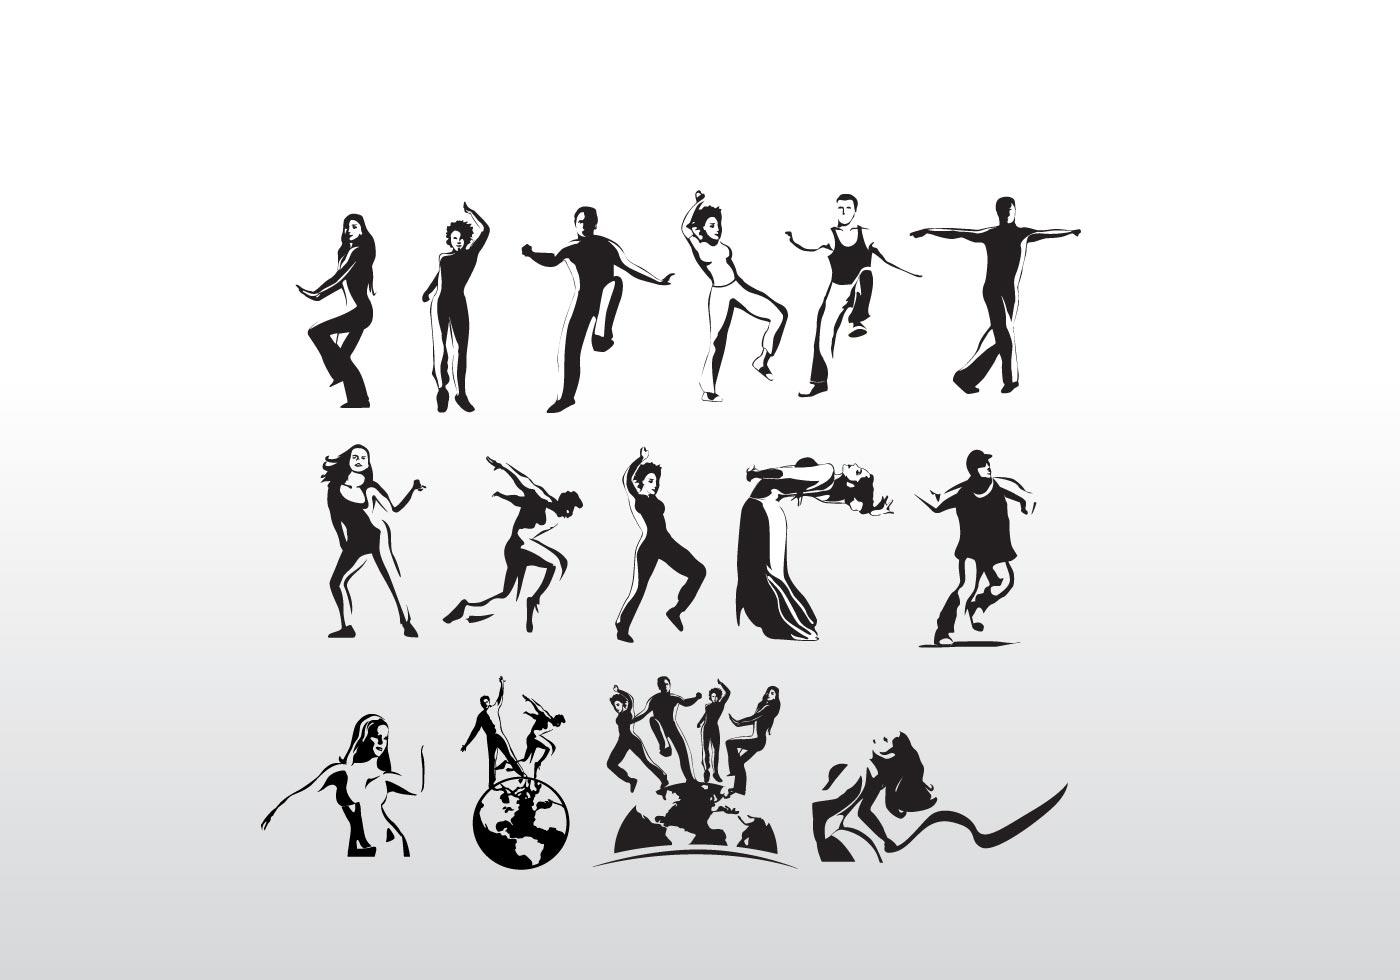 Aerobic Art Dancer Vector Silhouettes